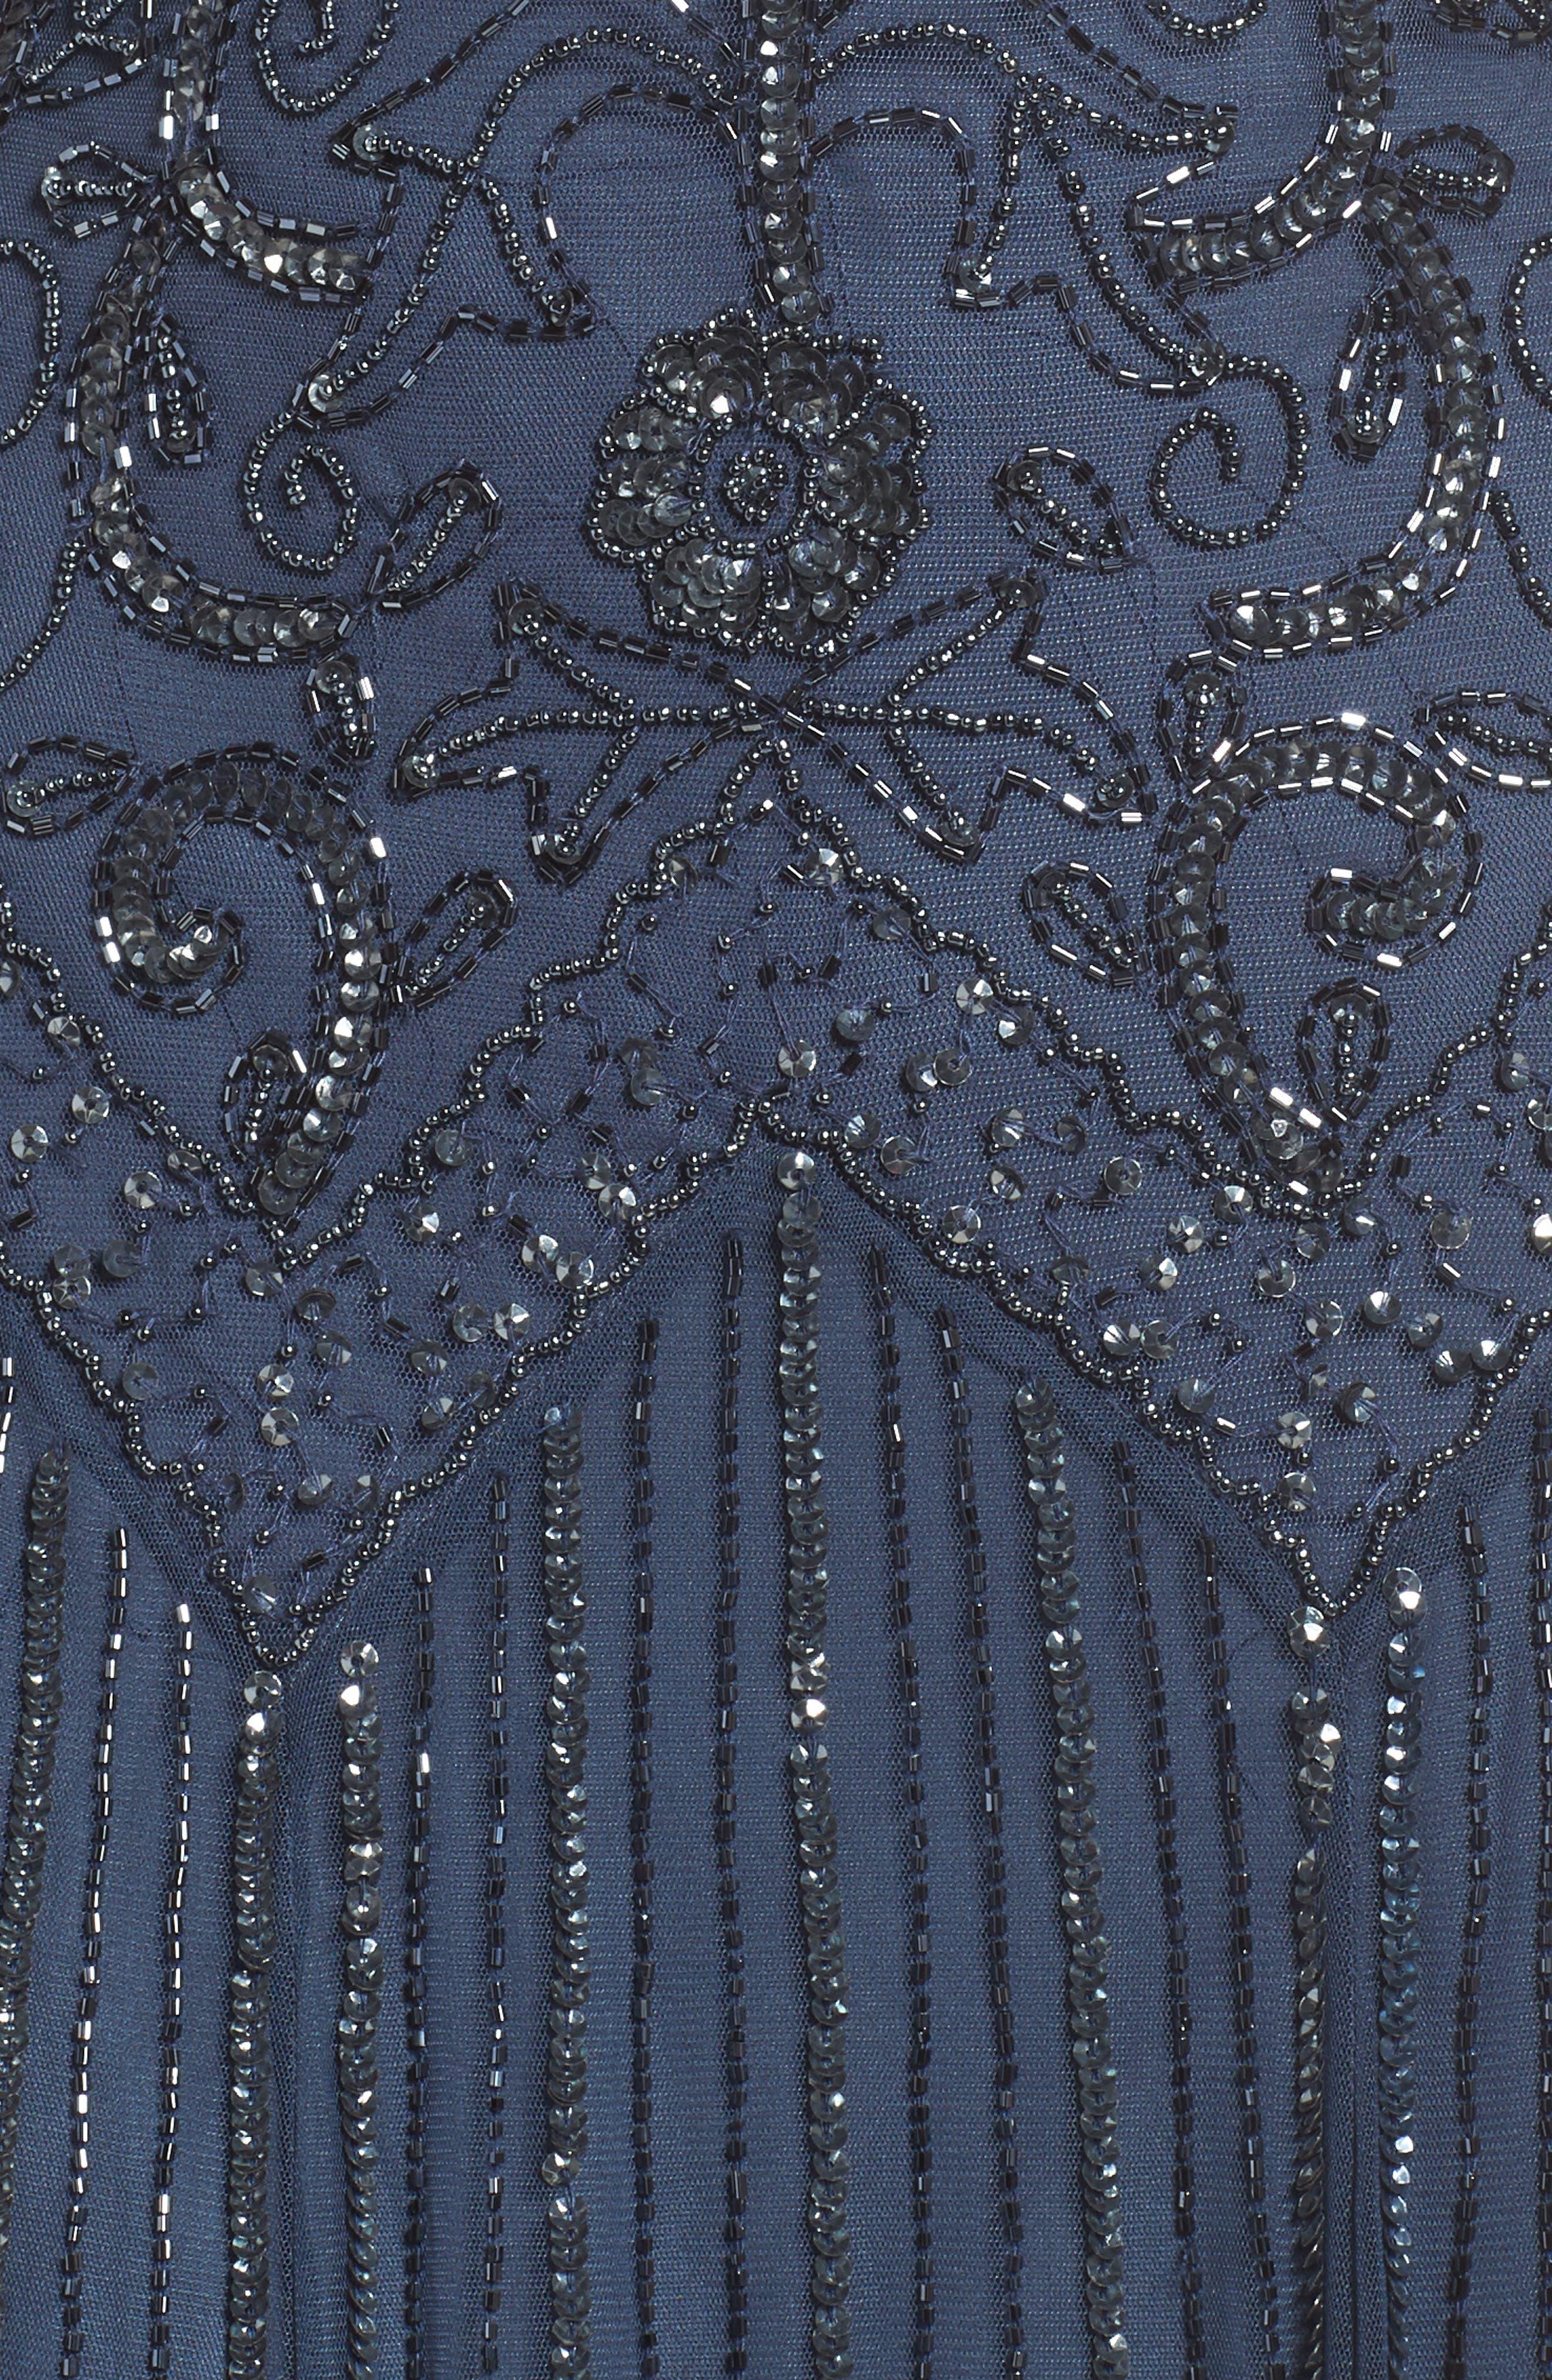 Beaded Mesh Tea Length Dress,                             Alternate thumbnail 5, color,                             Blue